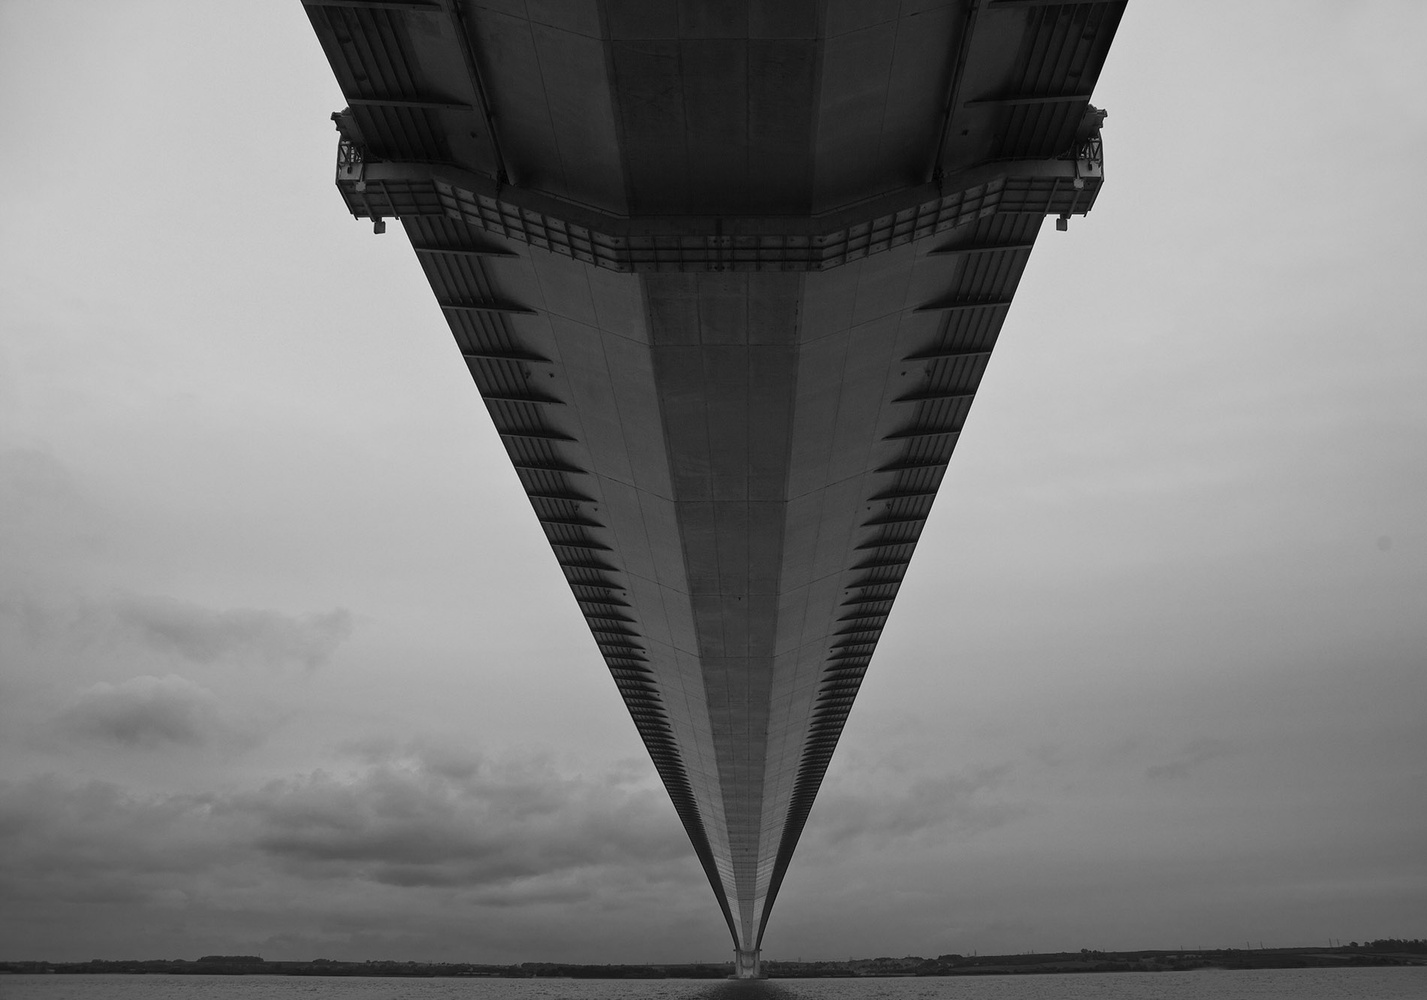 Humber Bridge by Imran Khan